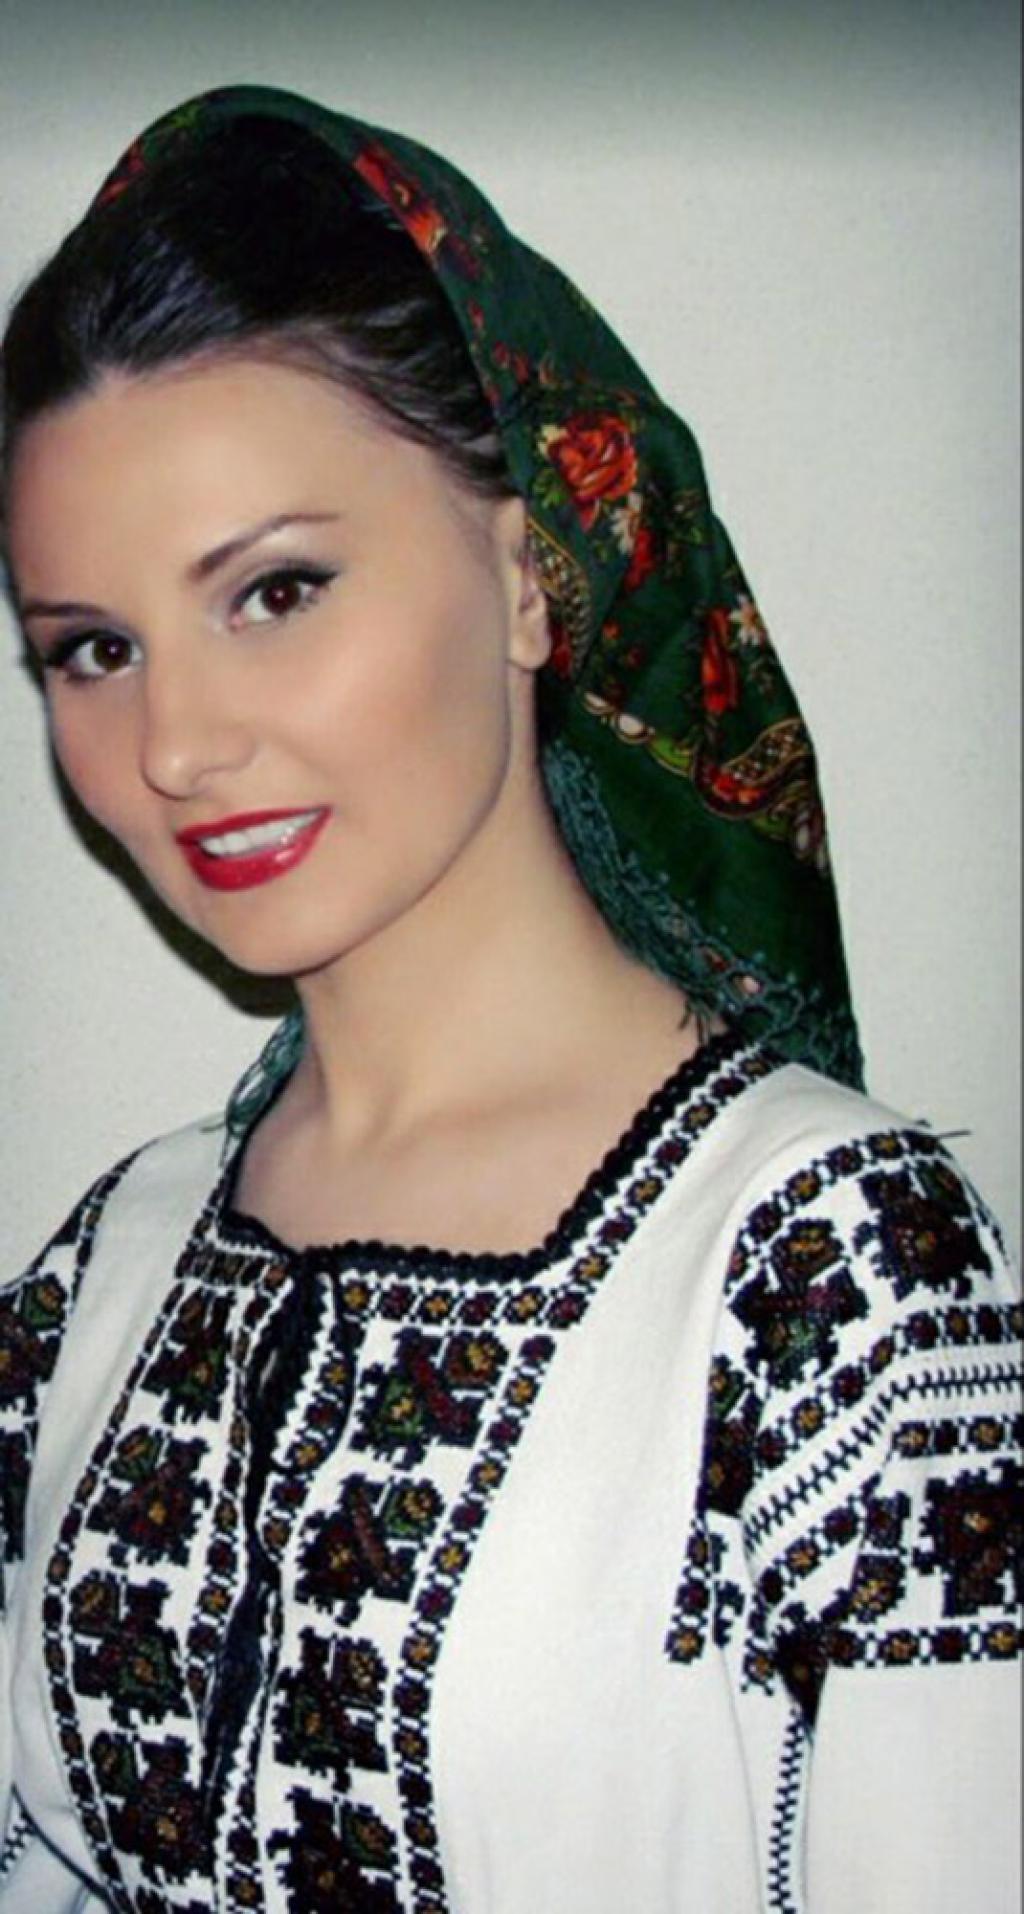 fete frumoase din Alba Iulia care cauta barbati din Timișoara